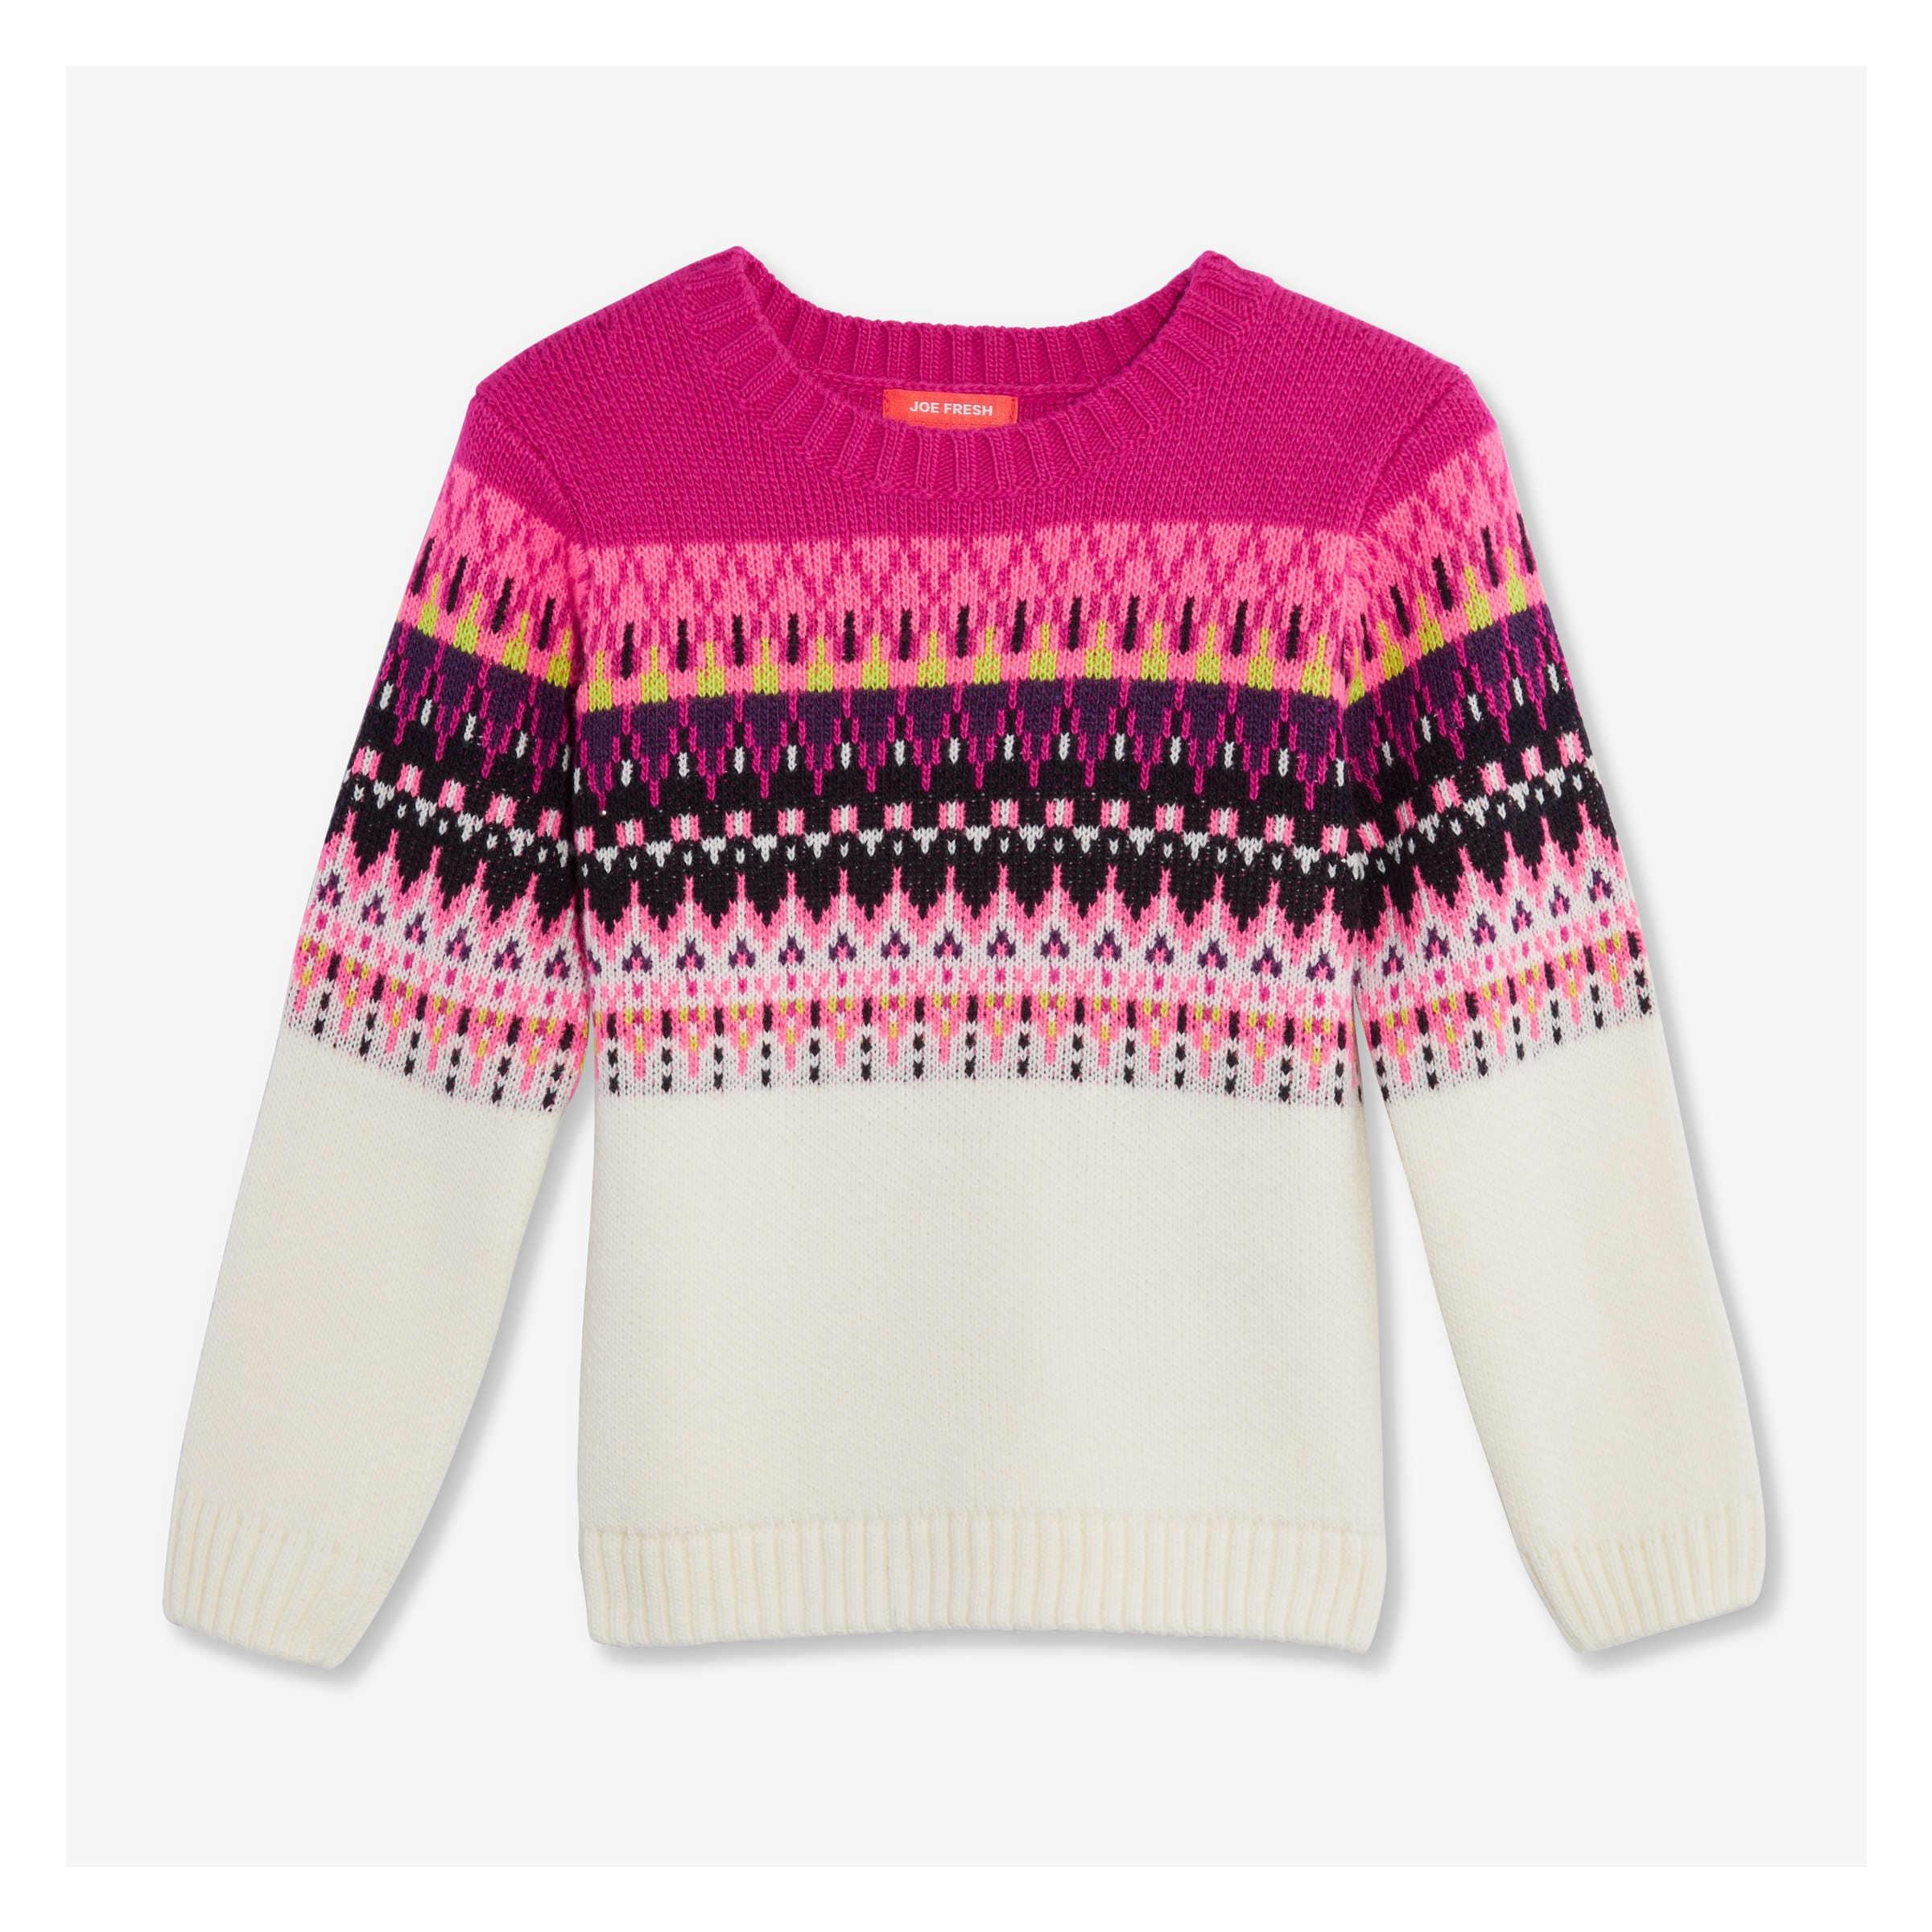 Joe Fresh Toddler Girls' Fair Isle Sweater